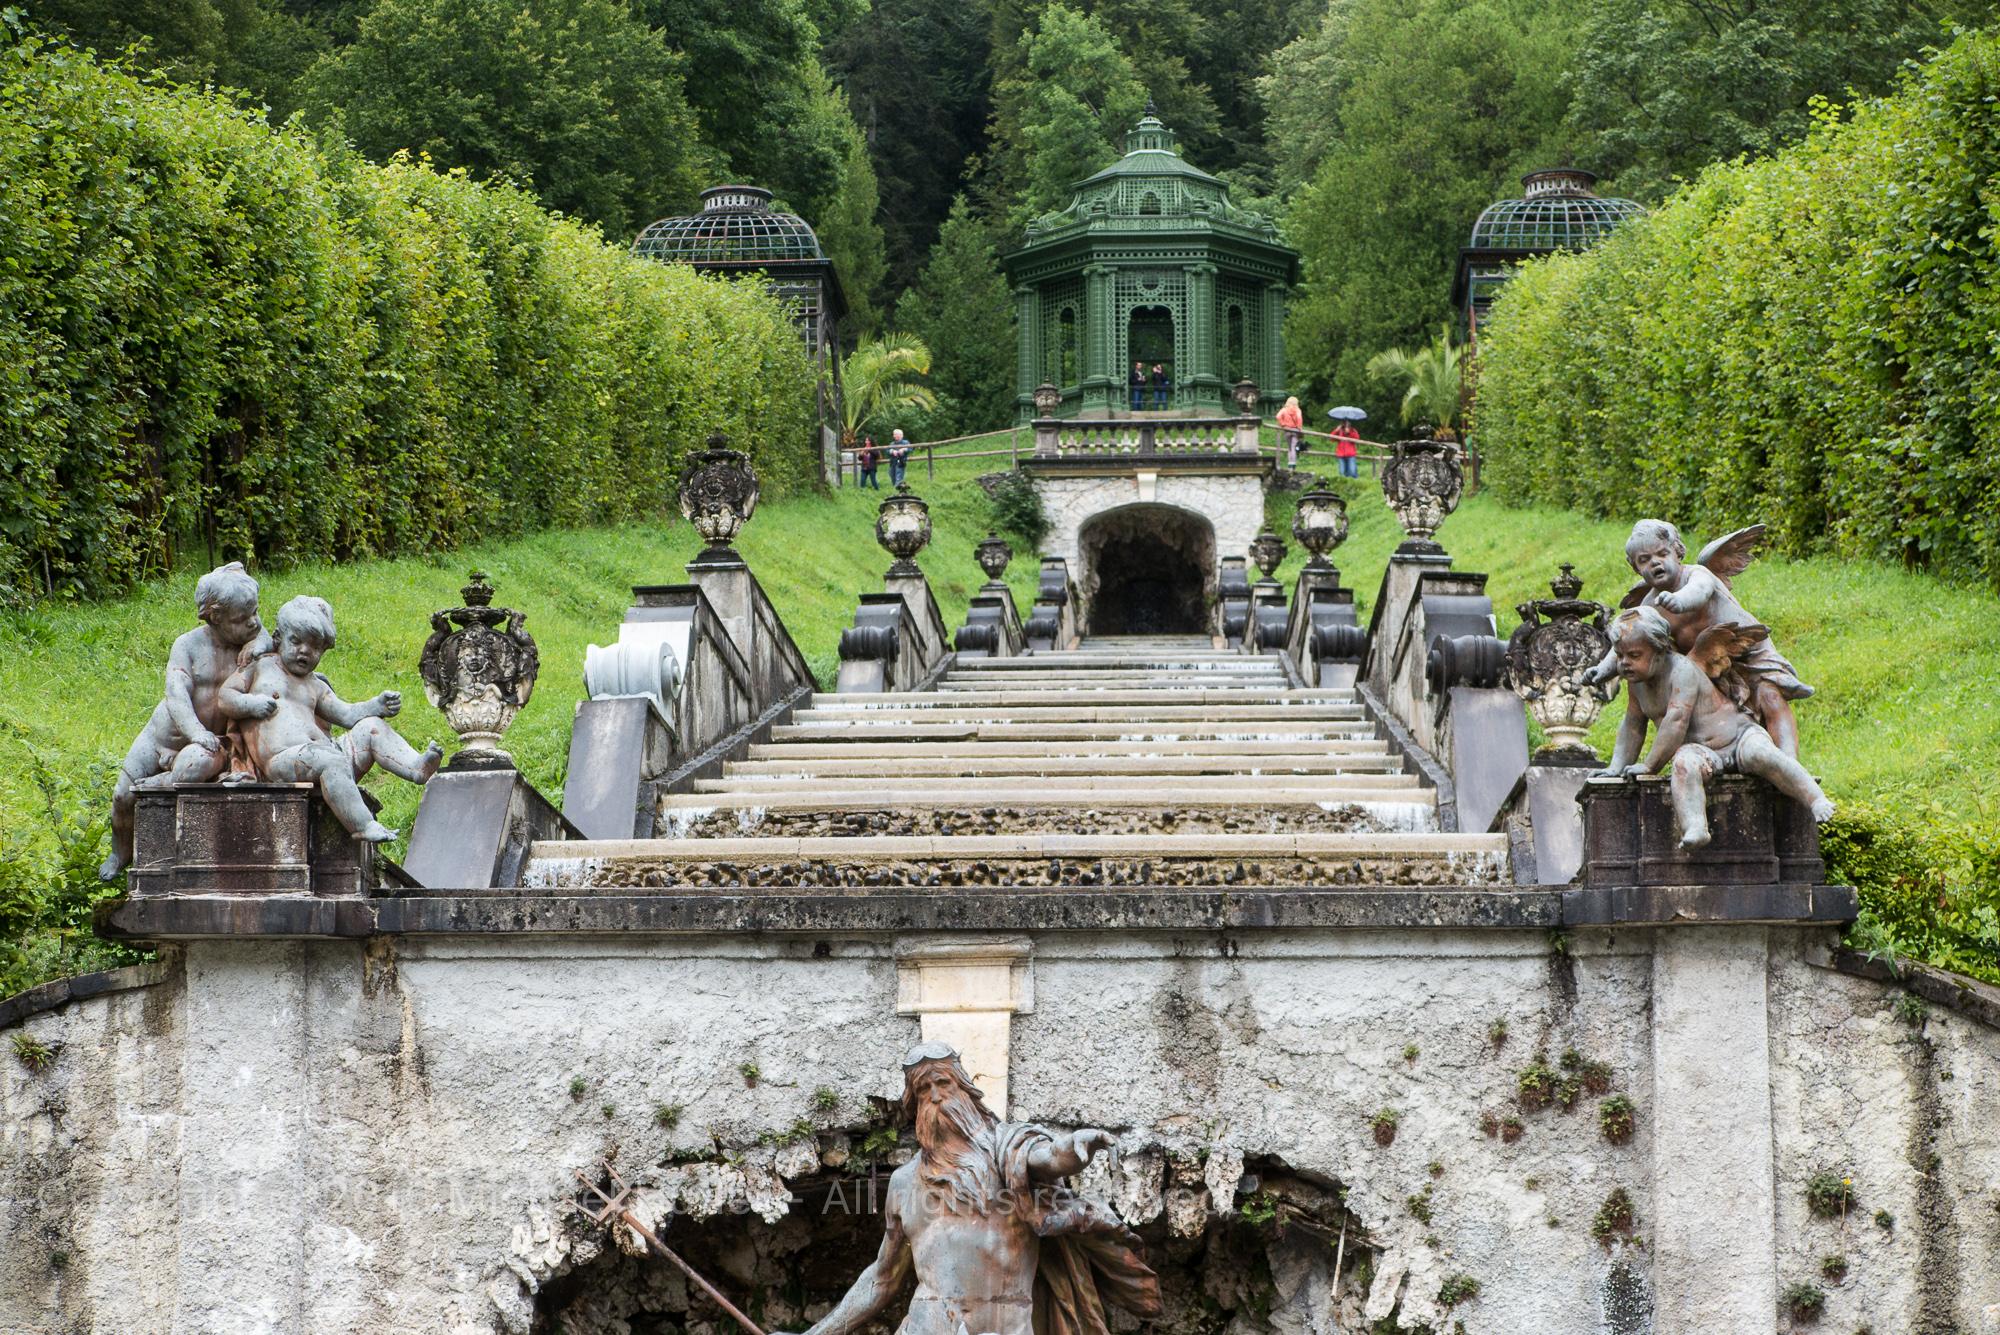 17.08.2015, Oberstdorfurlaub, Schloss Linderhof